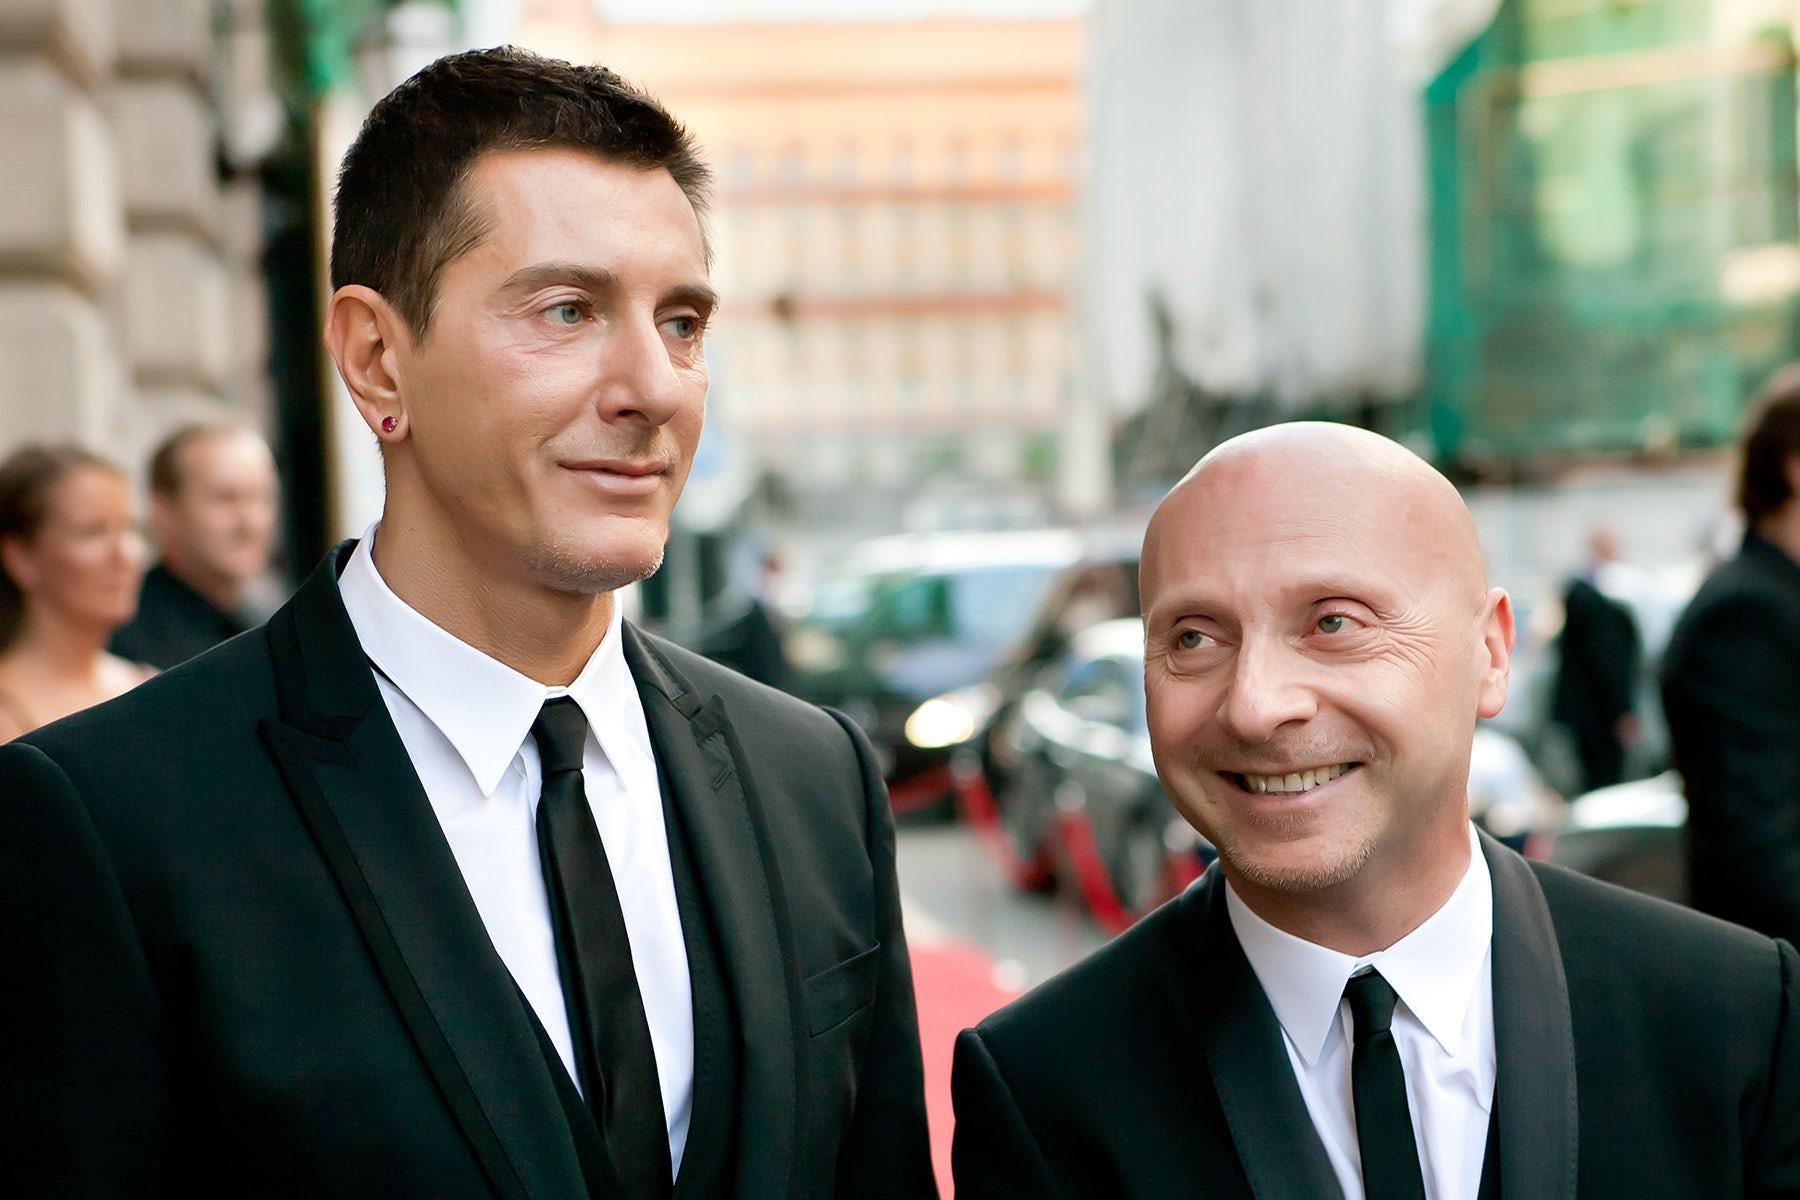 Domenico Dolce and Stefano Gabbana | Source: Shutterstock